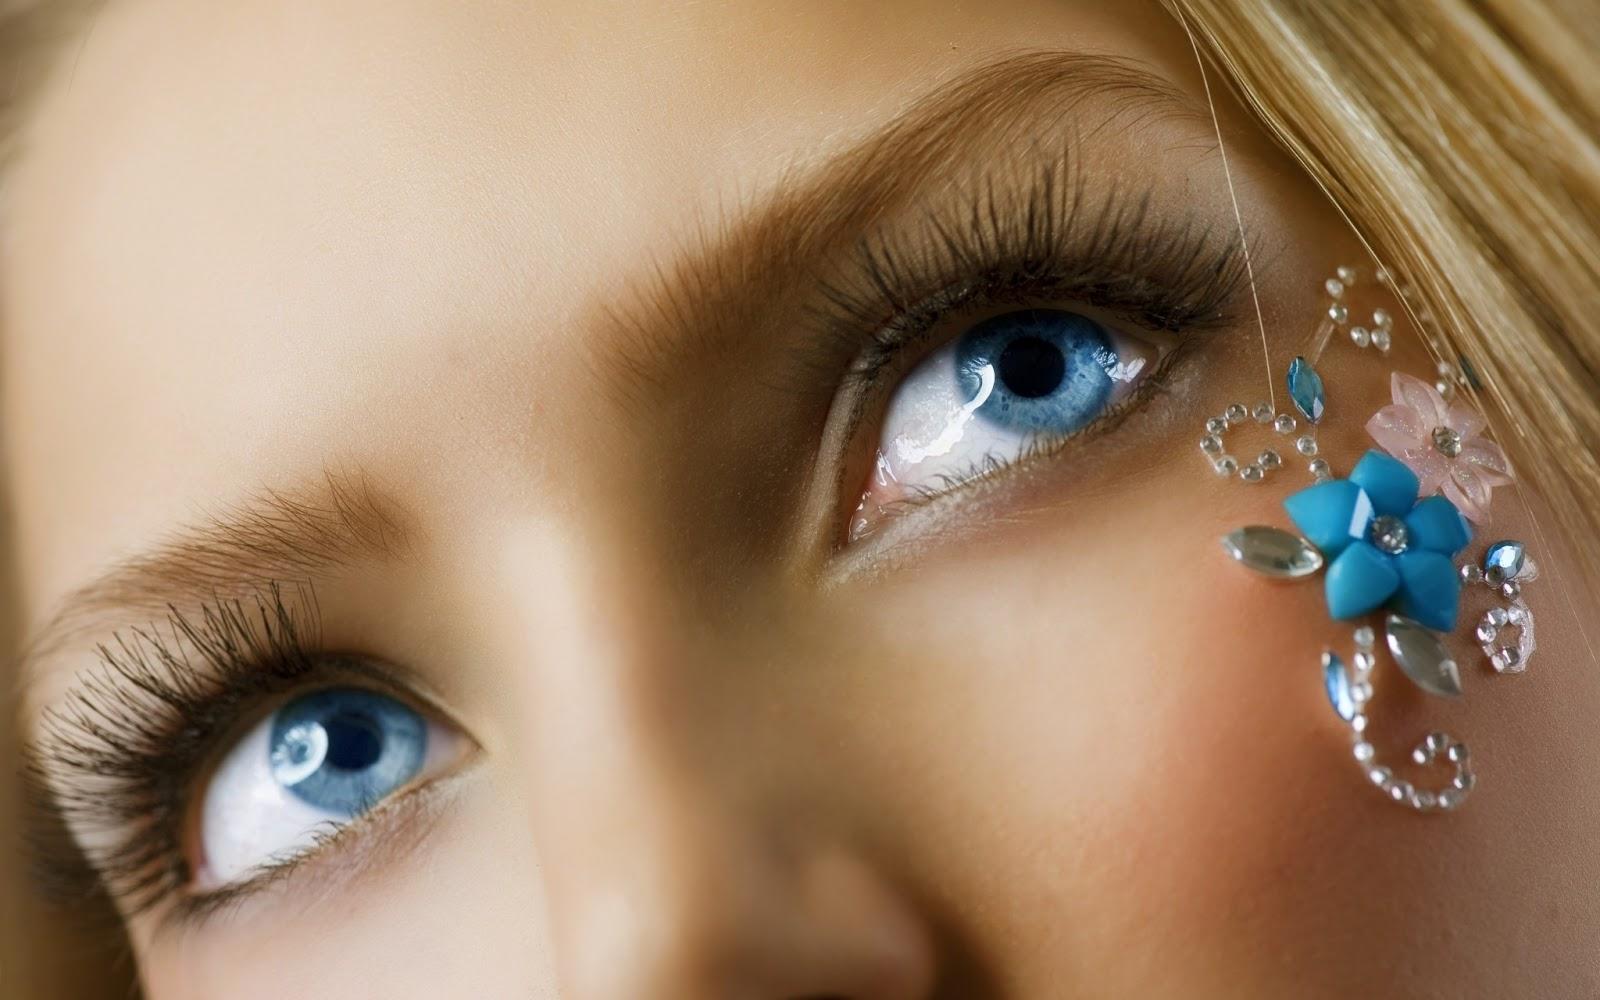 Hermosa Chica Rubia De Ojos Azules Fotos Mujeres